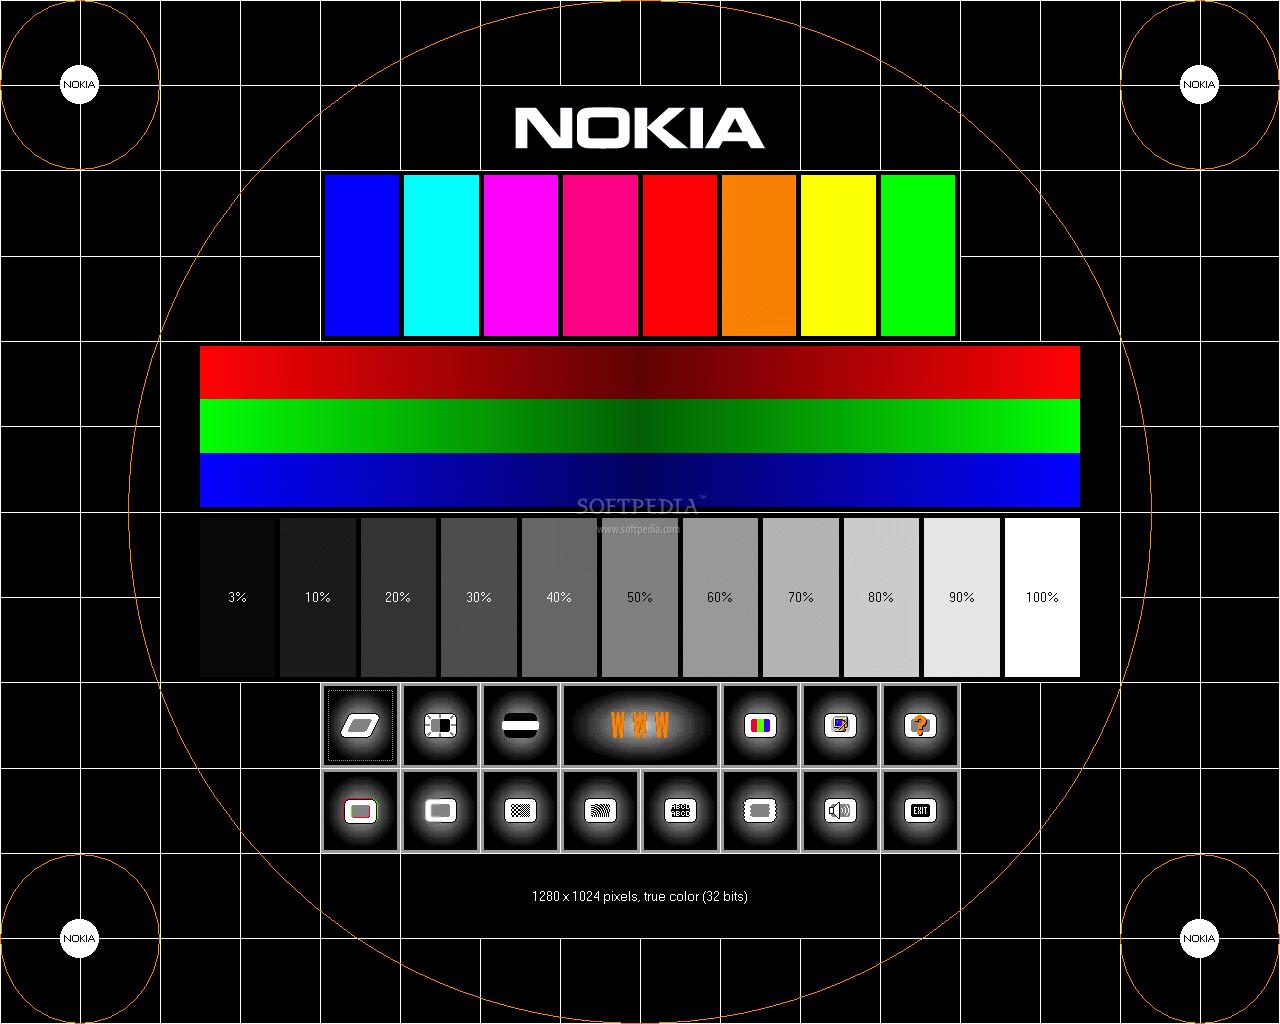 Nokia Monitor Test screenshot 1